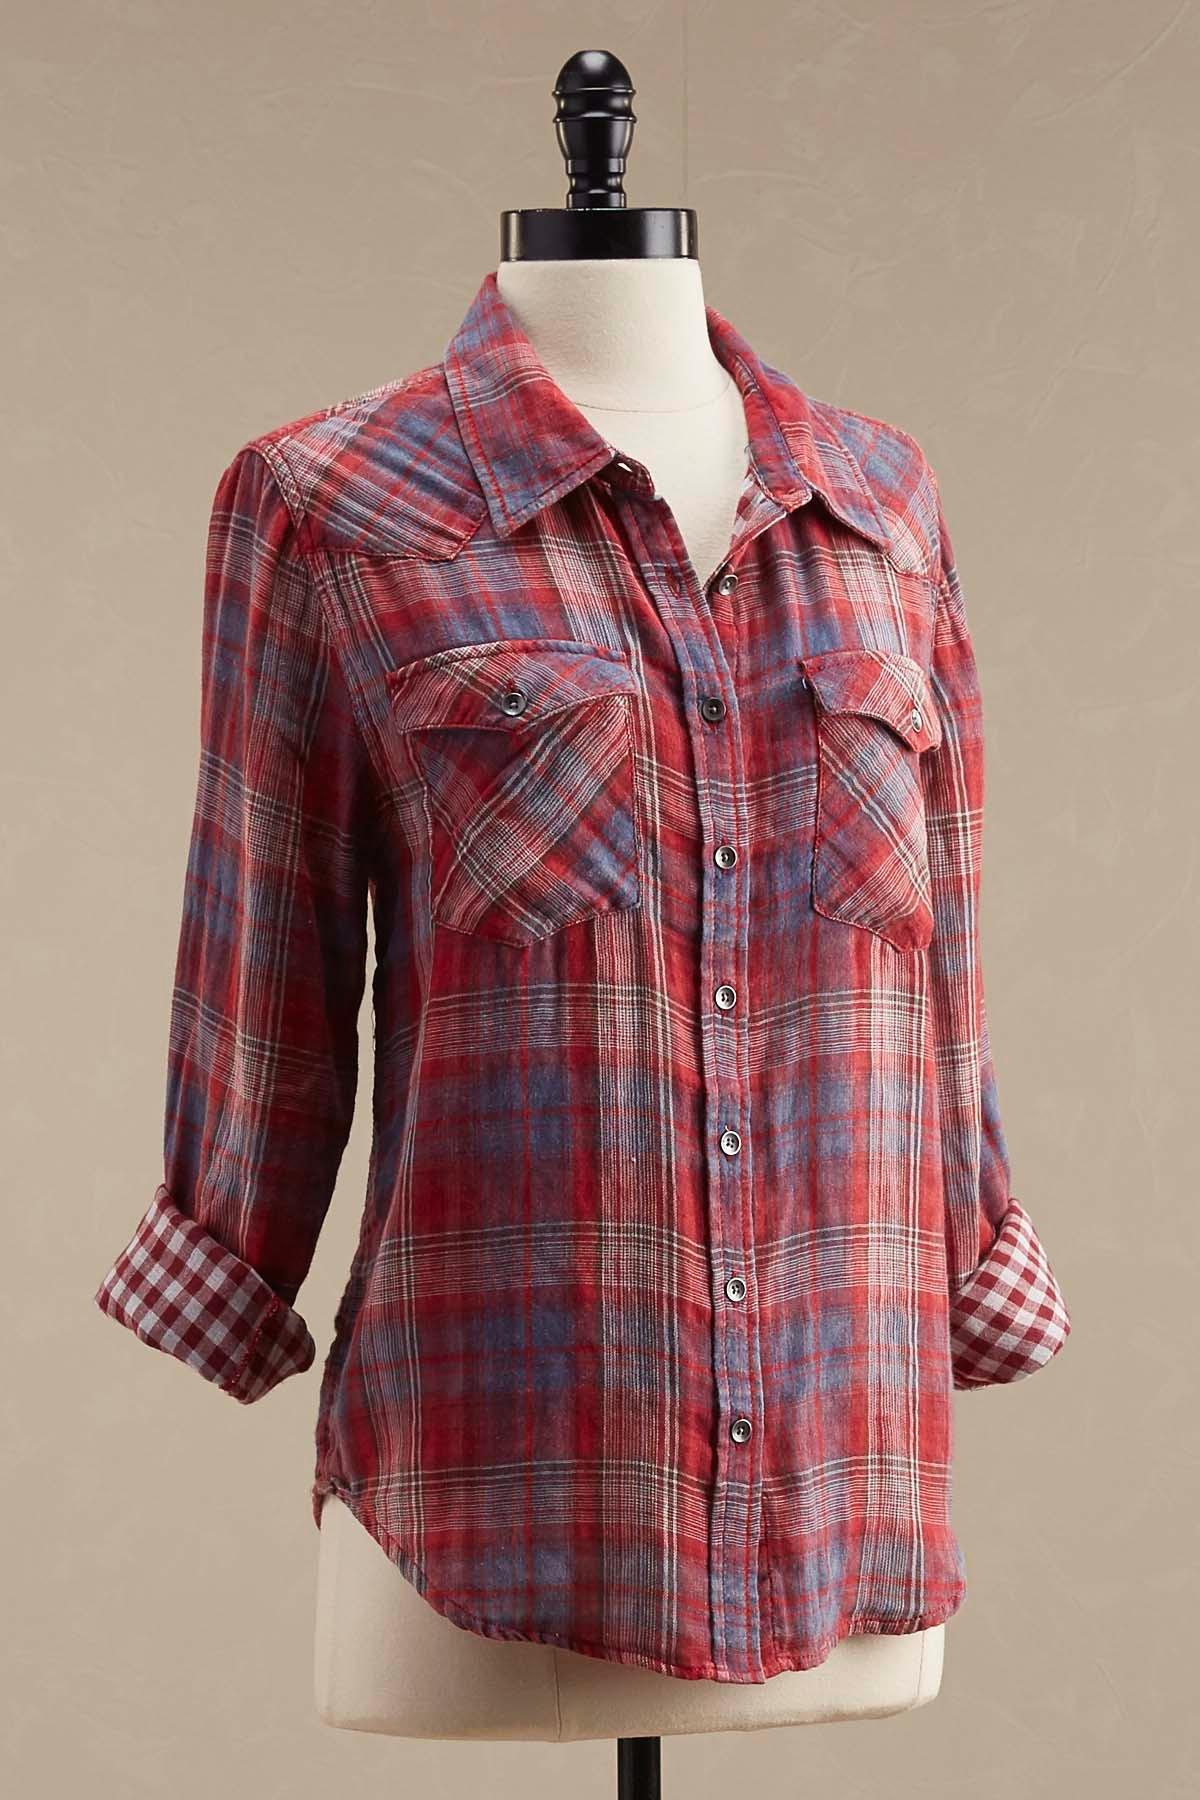 Double Layer Plaid Shirt